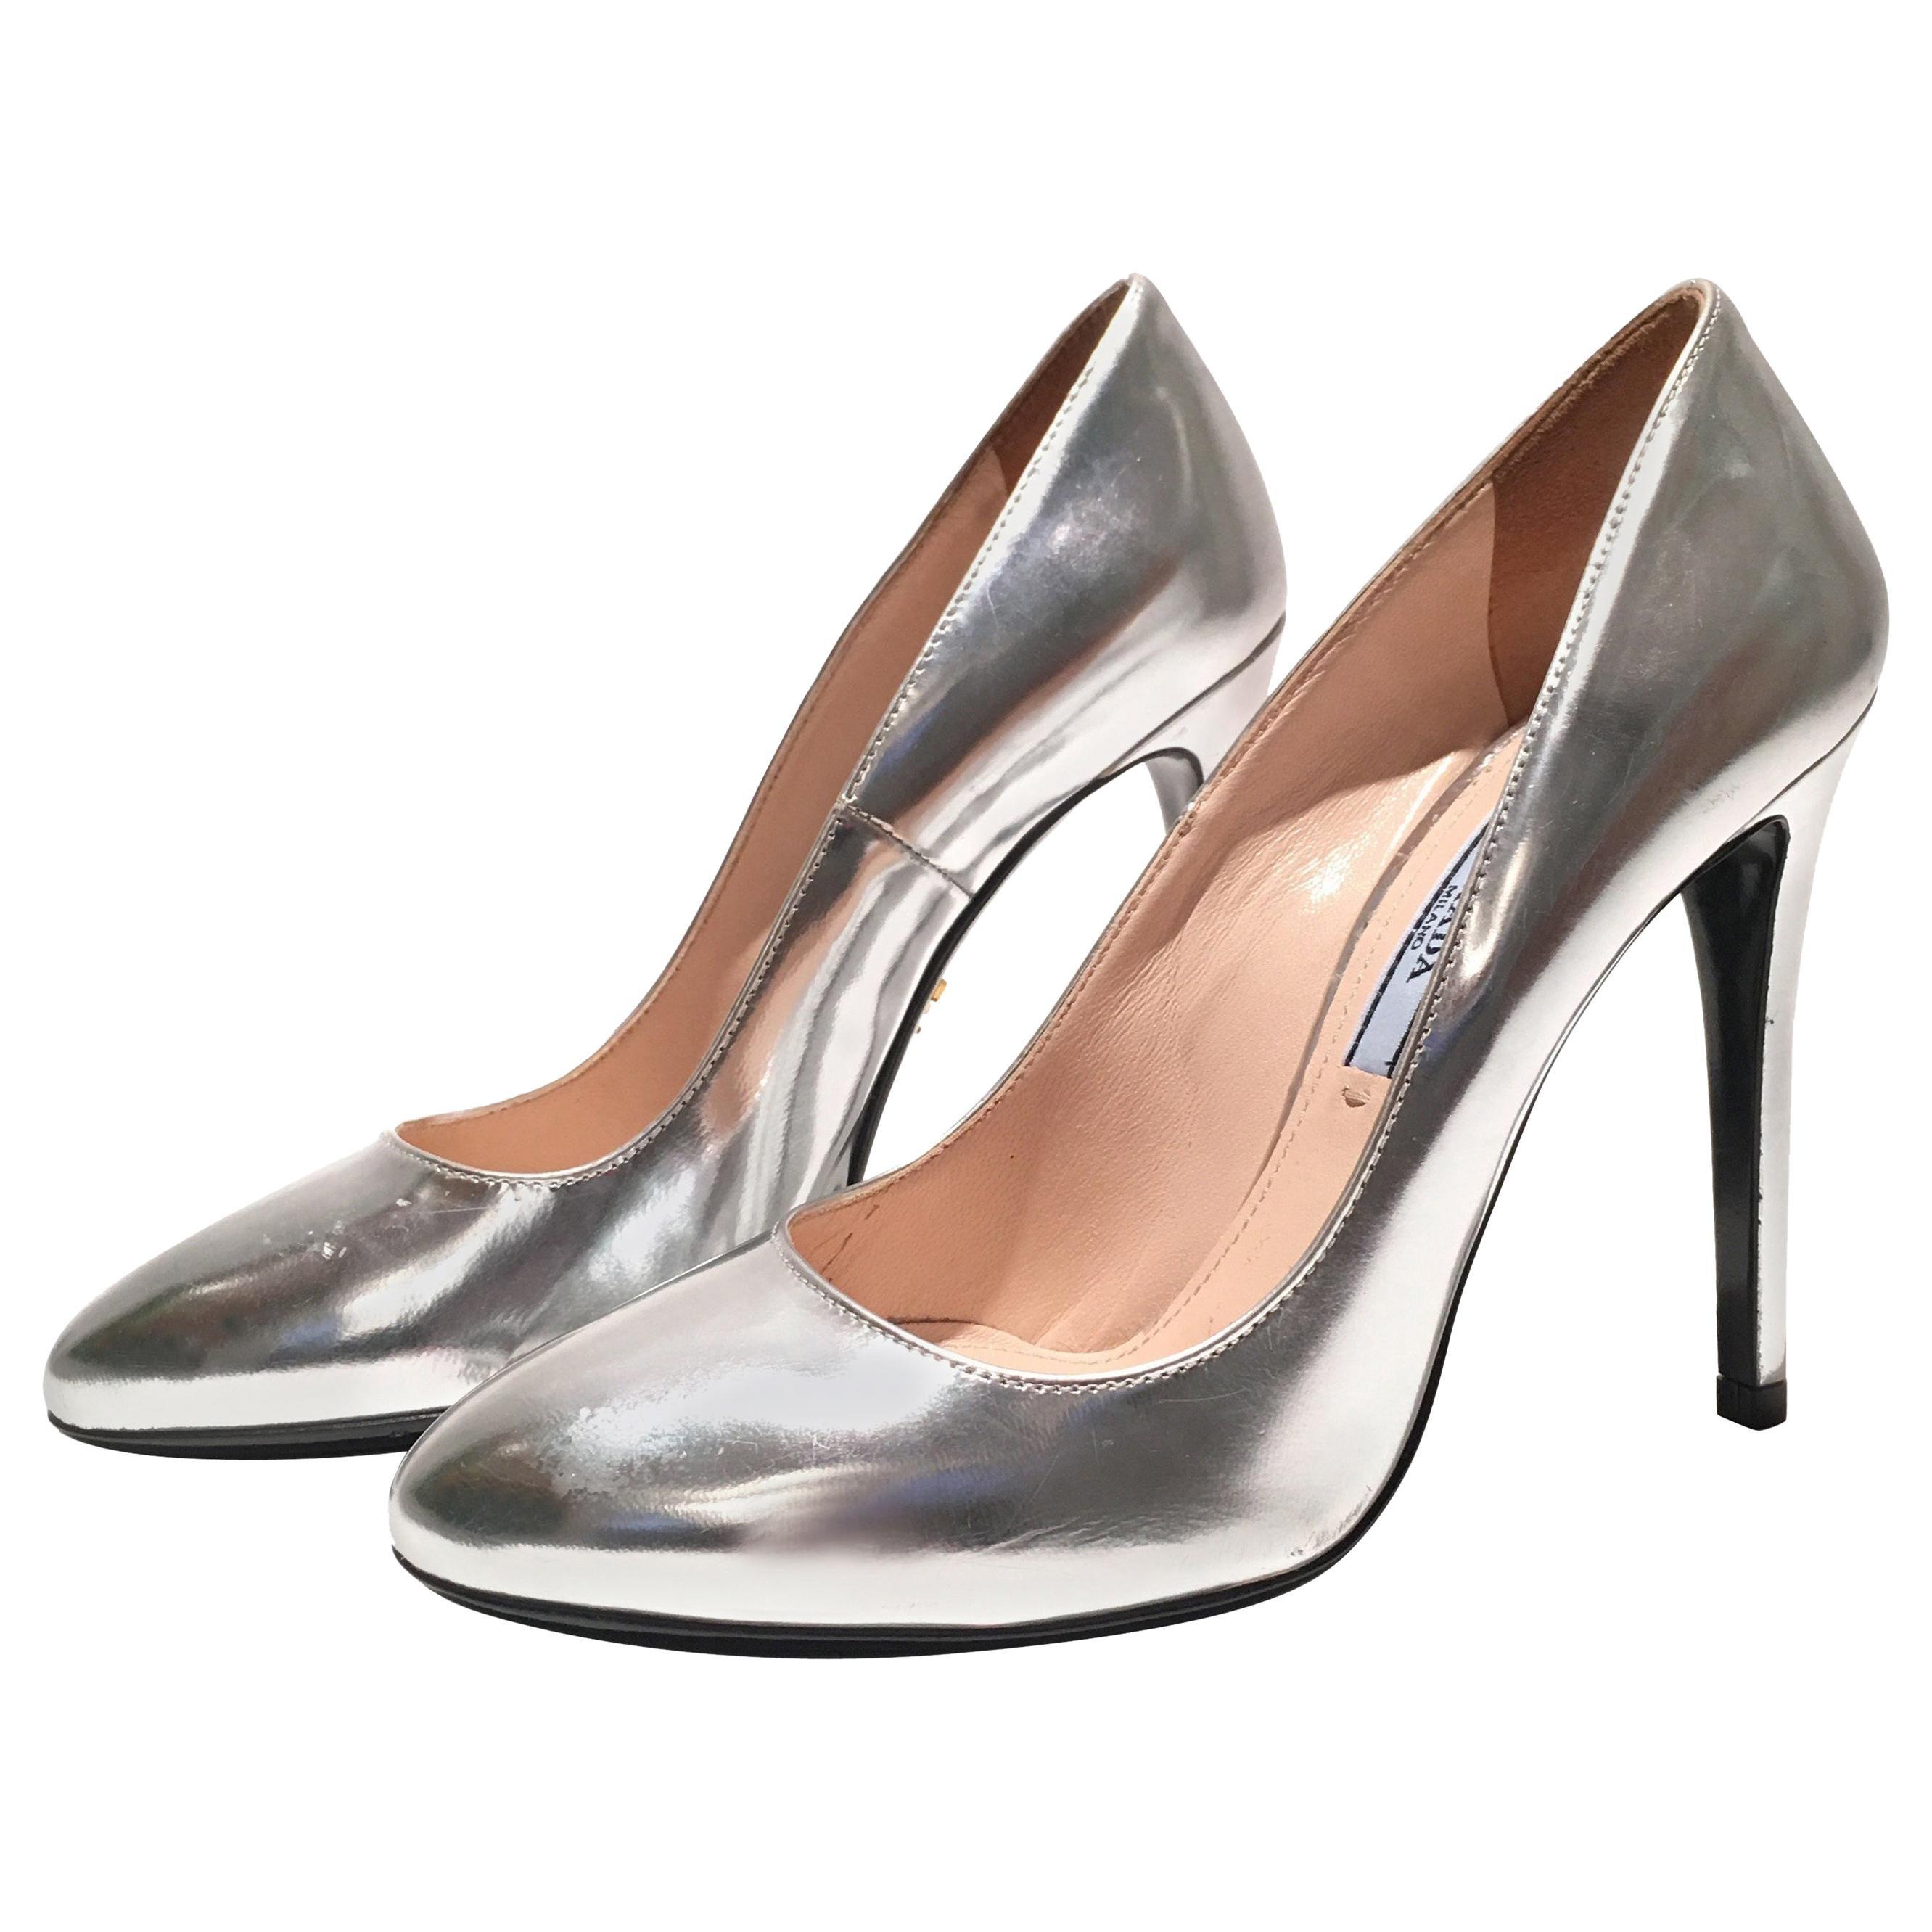 Prada Silver Metallic Heels